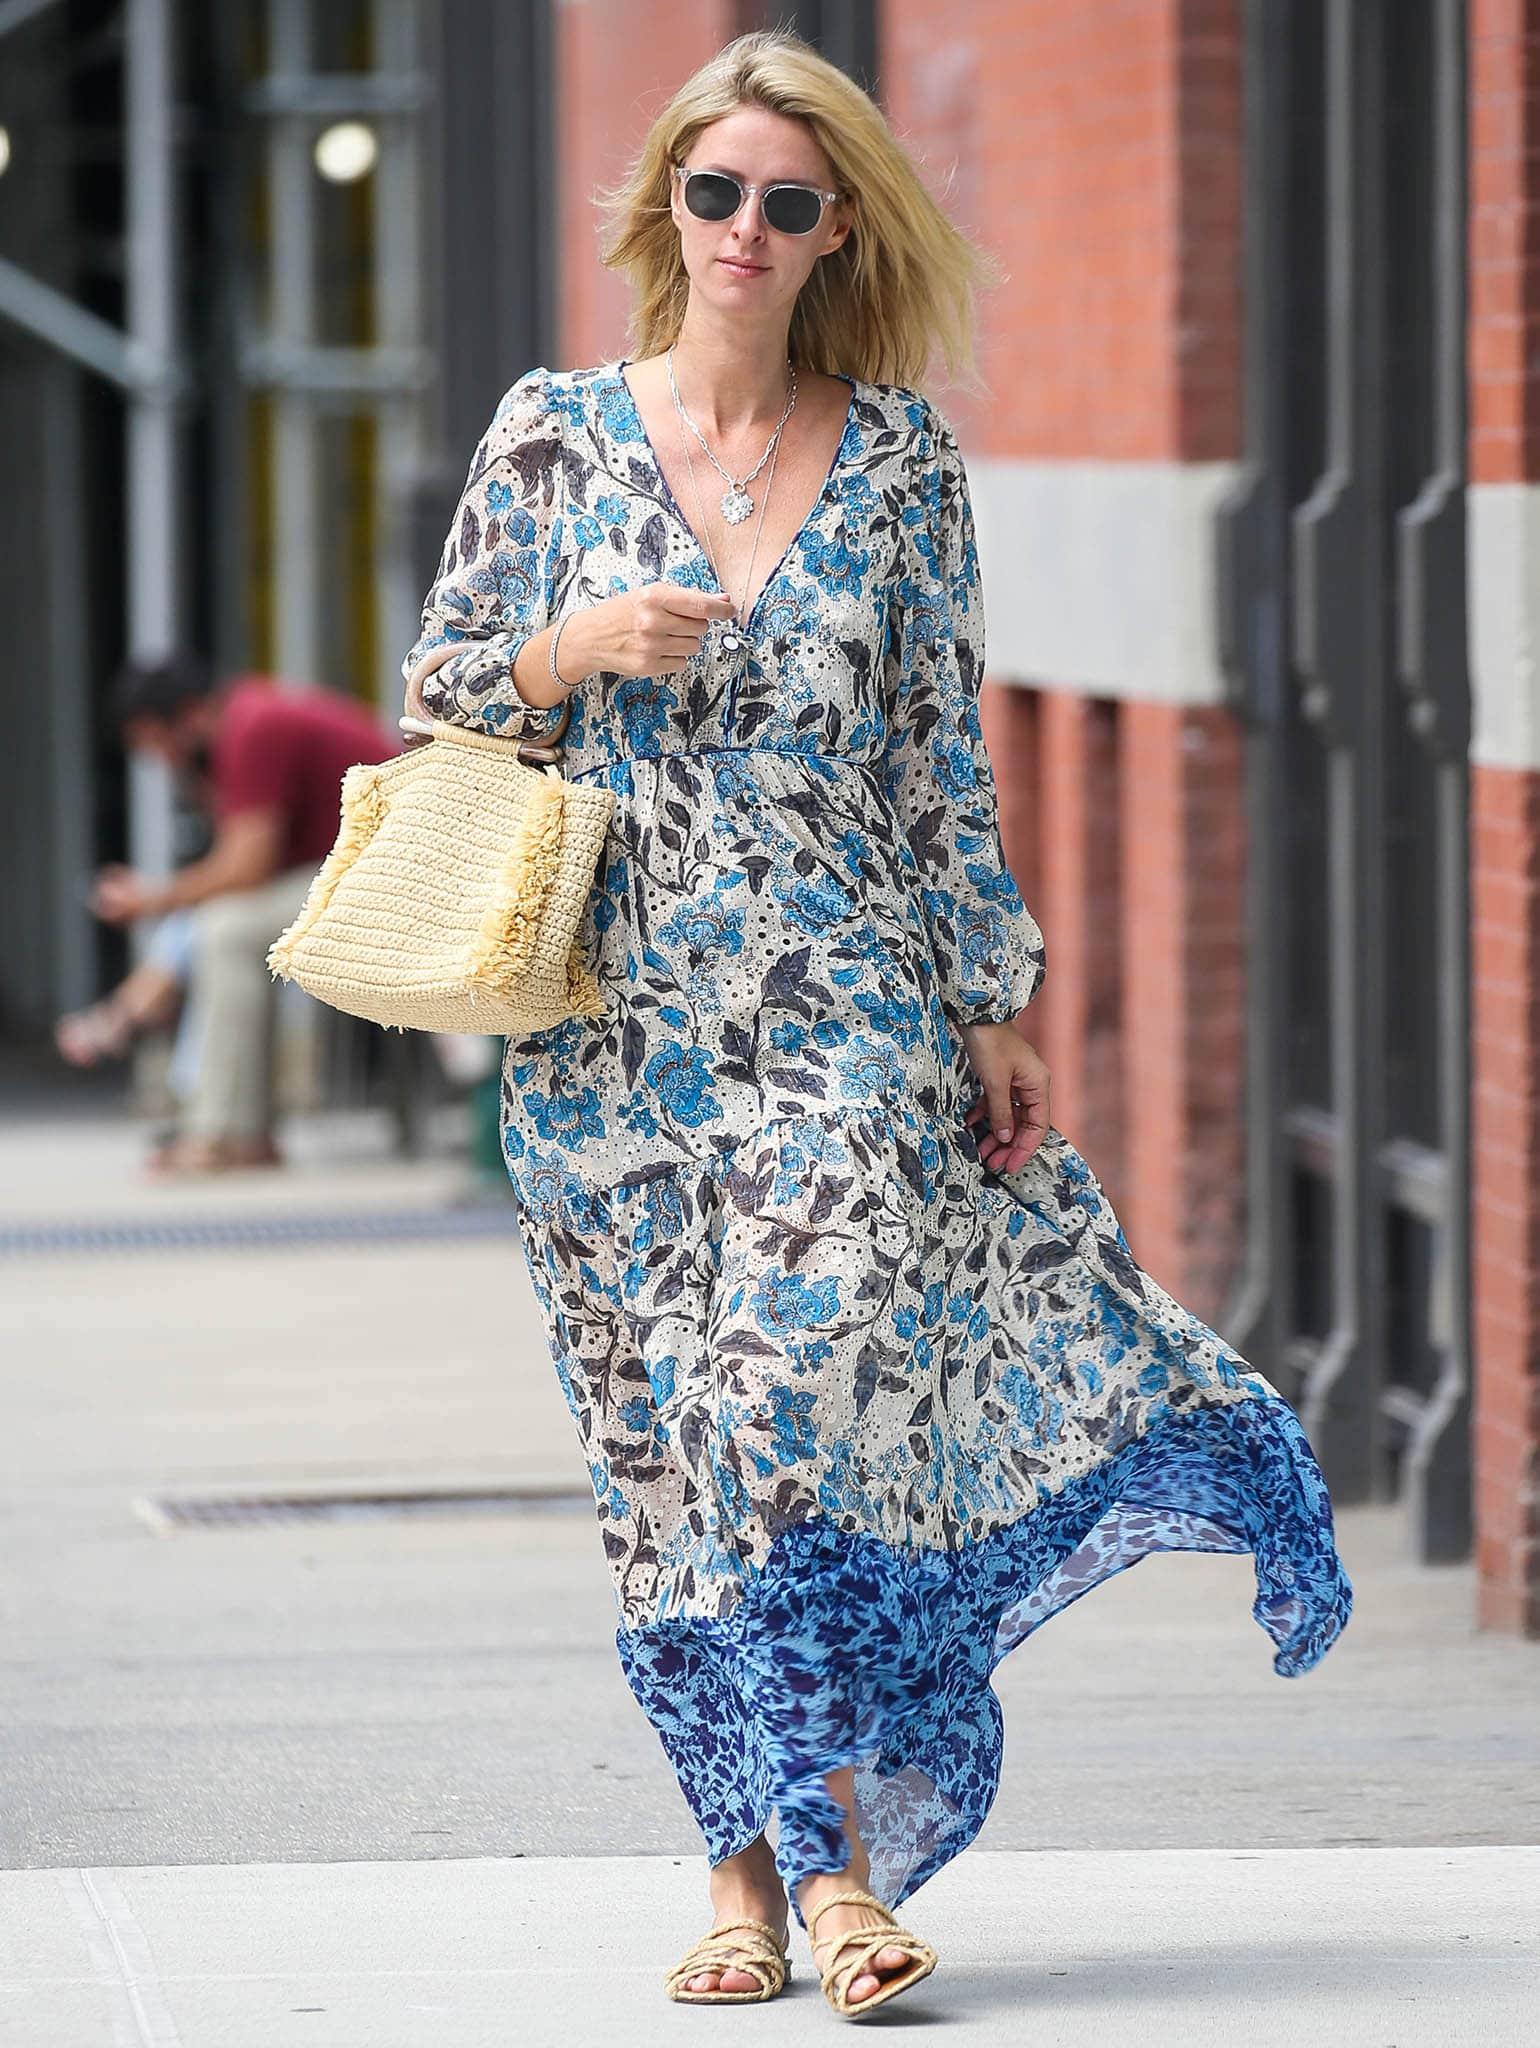 Nicky Hilton teams her Misa LA blue floral maxi dress with a Carolina Santa Domingo raffia tote